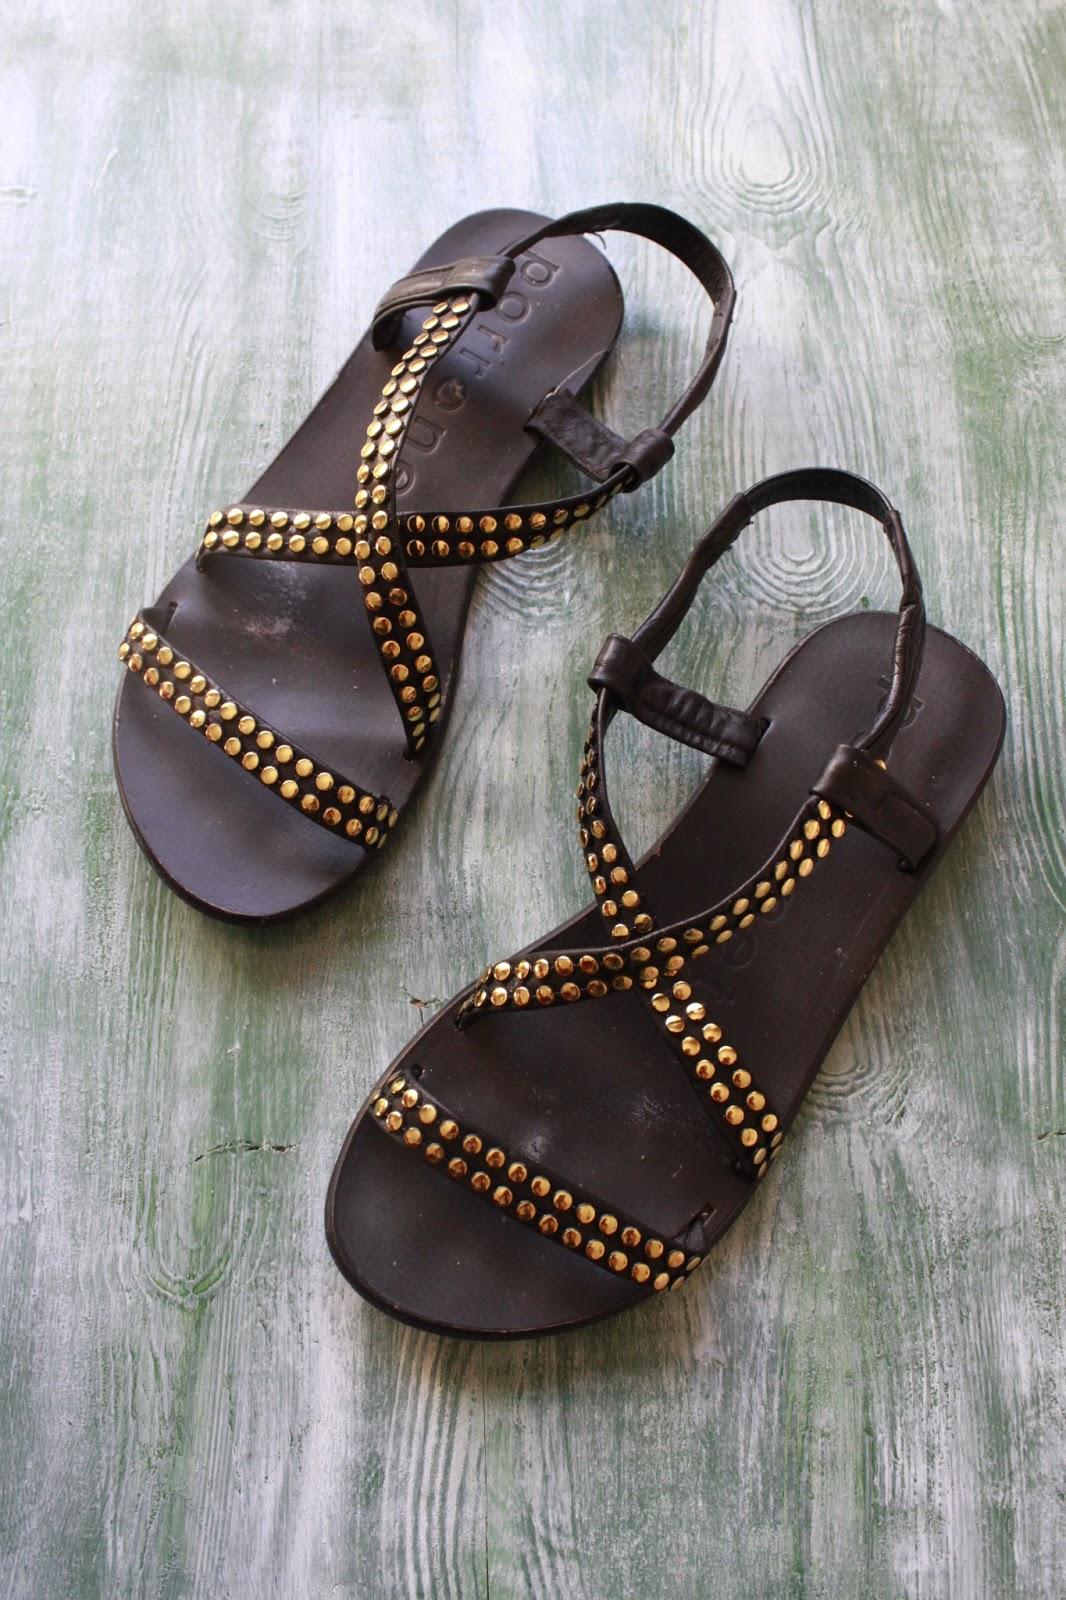 Manualidades en casa hacer manualidades sandalias - Hacer manualidades desde casa ...